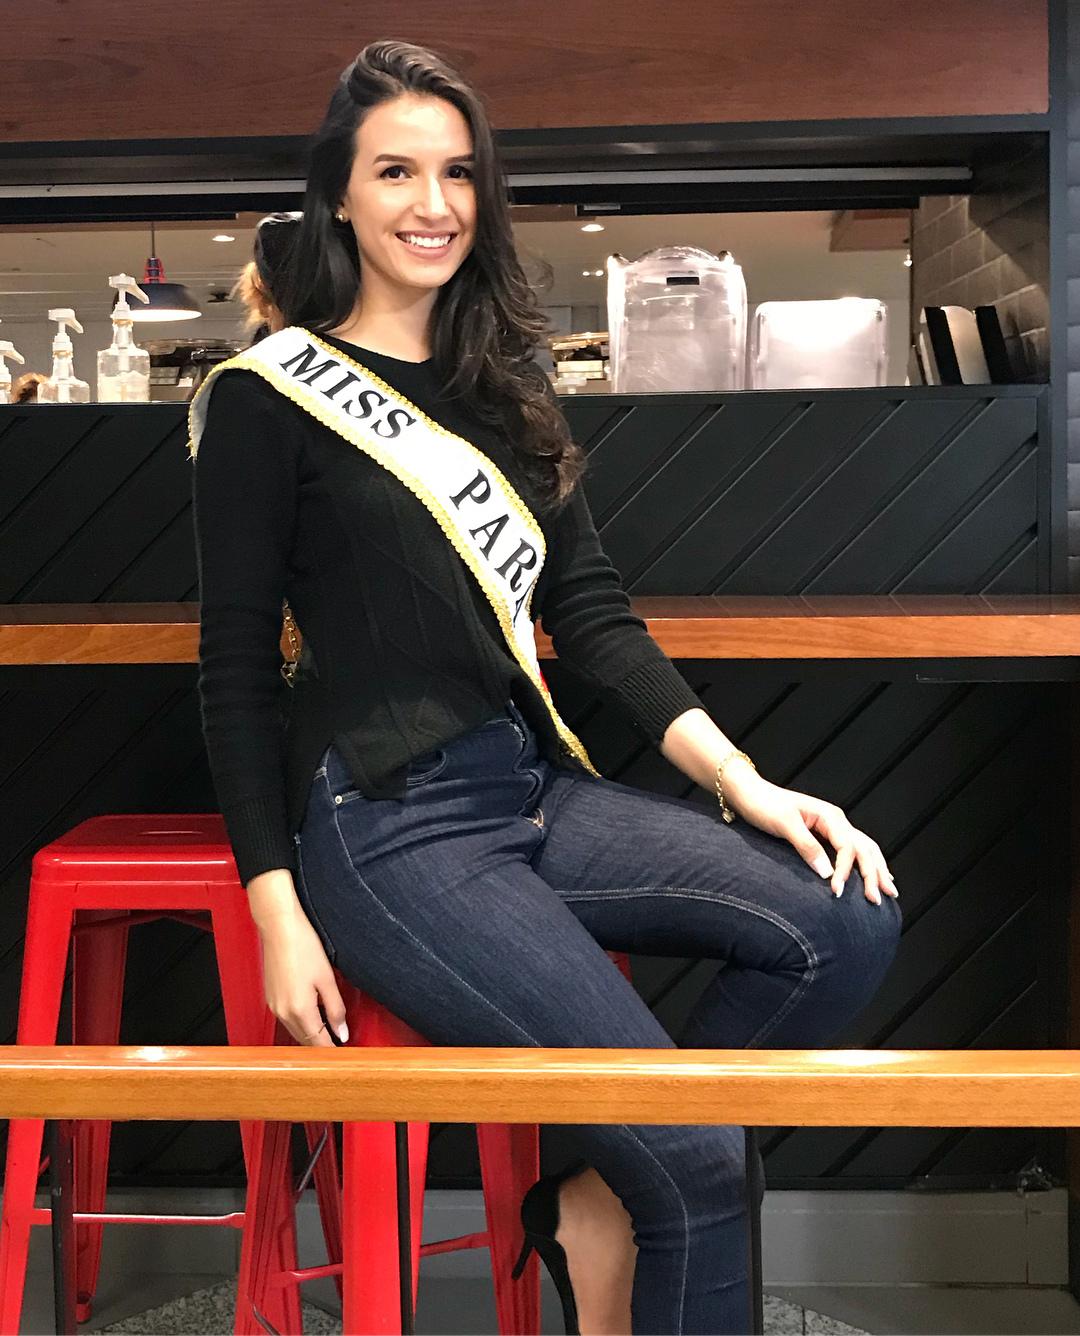 isabella garcia, top 8 de miss brasil mundo 2018/top 20 de miss brasil mundo 2019. - Página 2 38097012